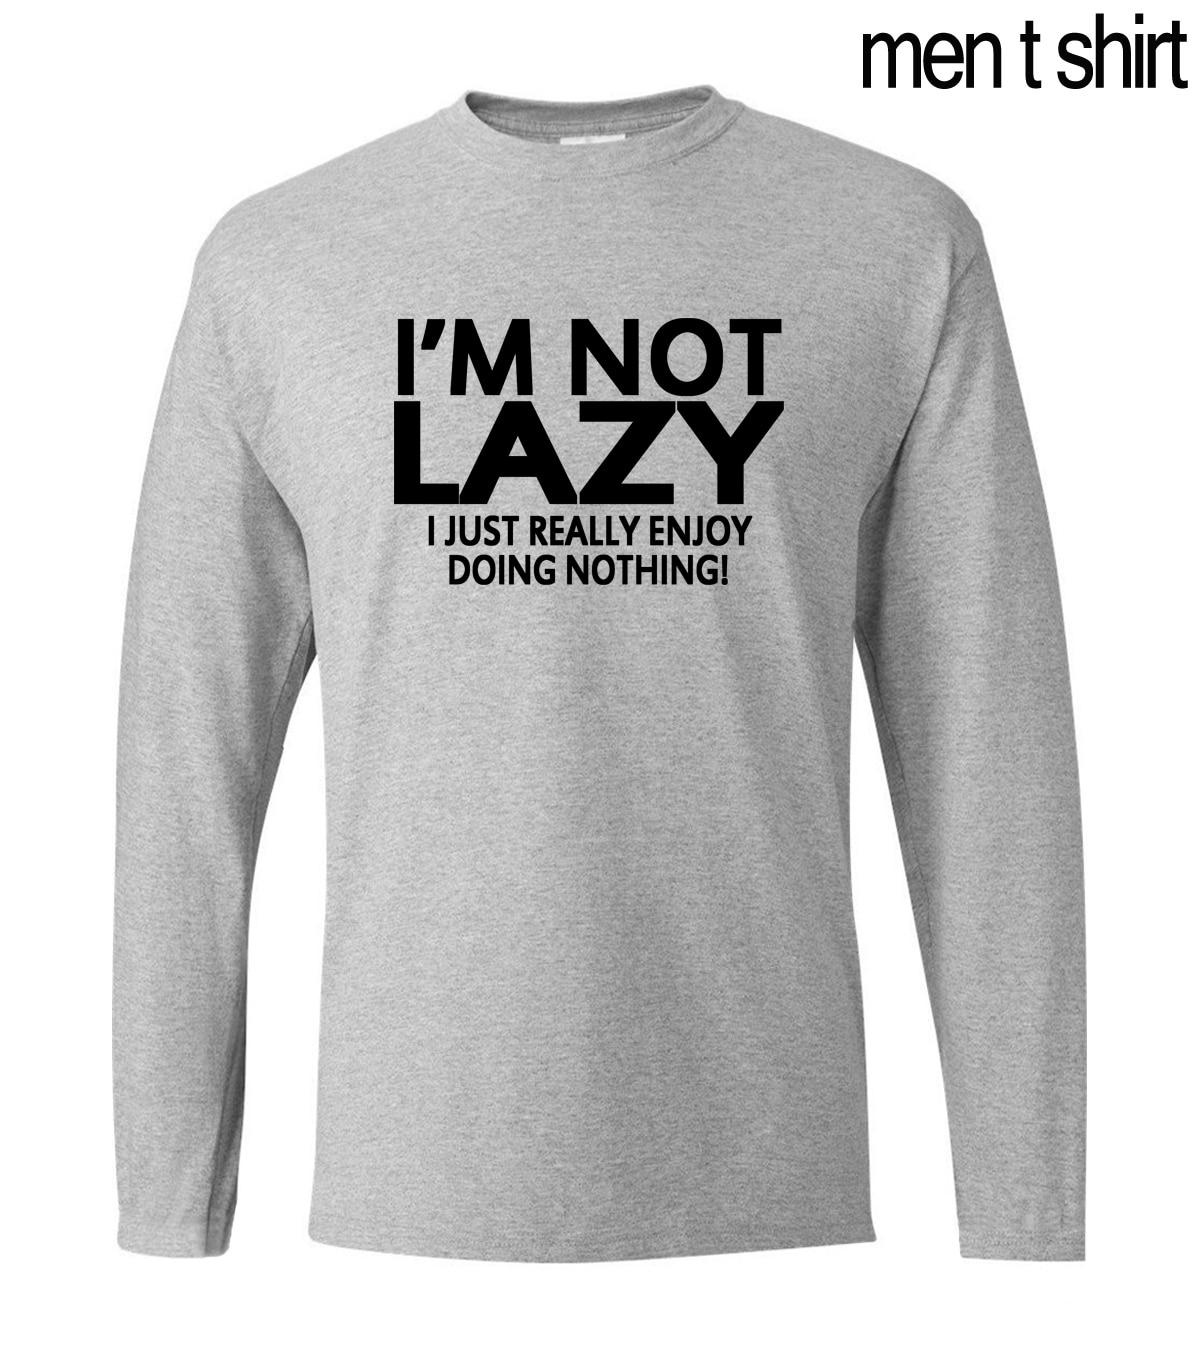 I'M NOT LAZY funny men t shirt 2019 spring newest 100% cotton high quality men's long sleeve T-shirts fitness slim man sportwear